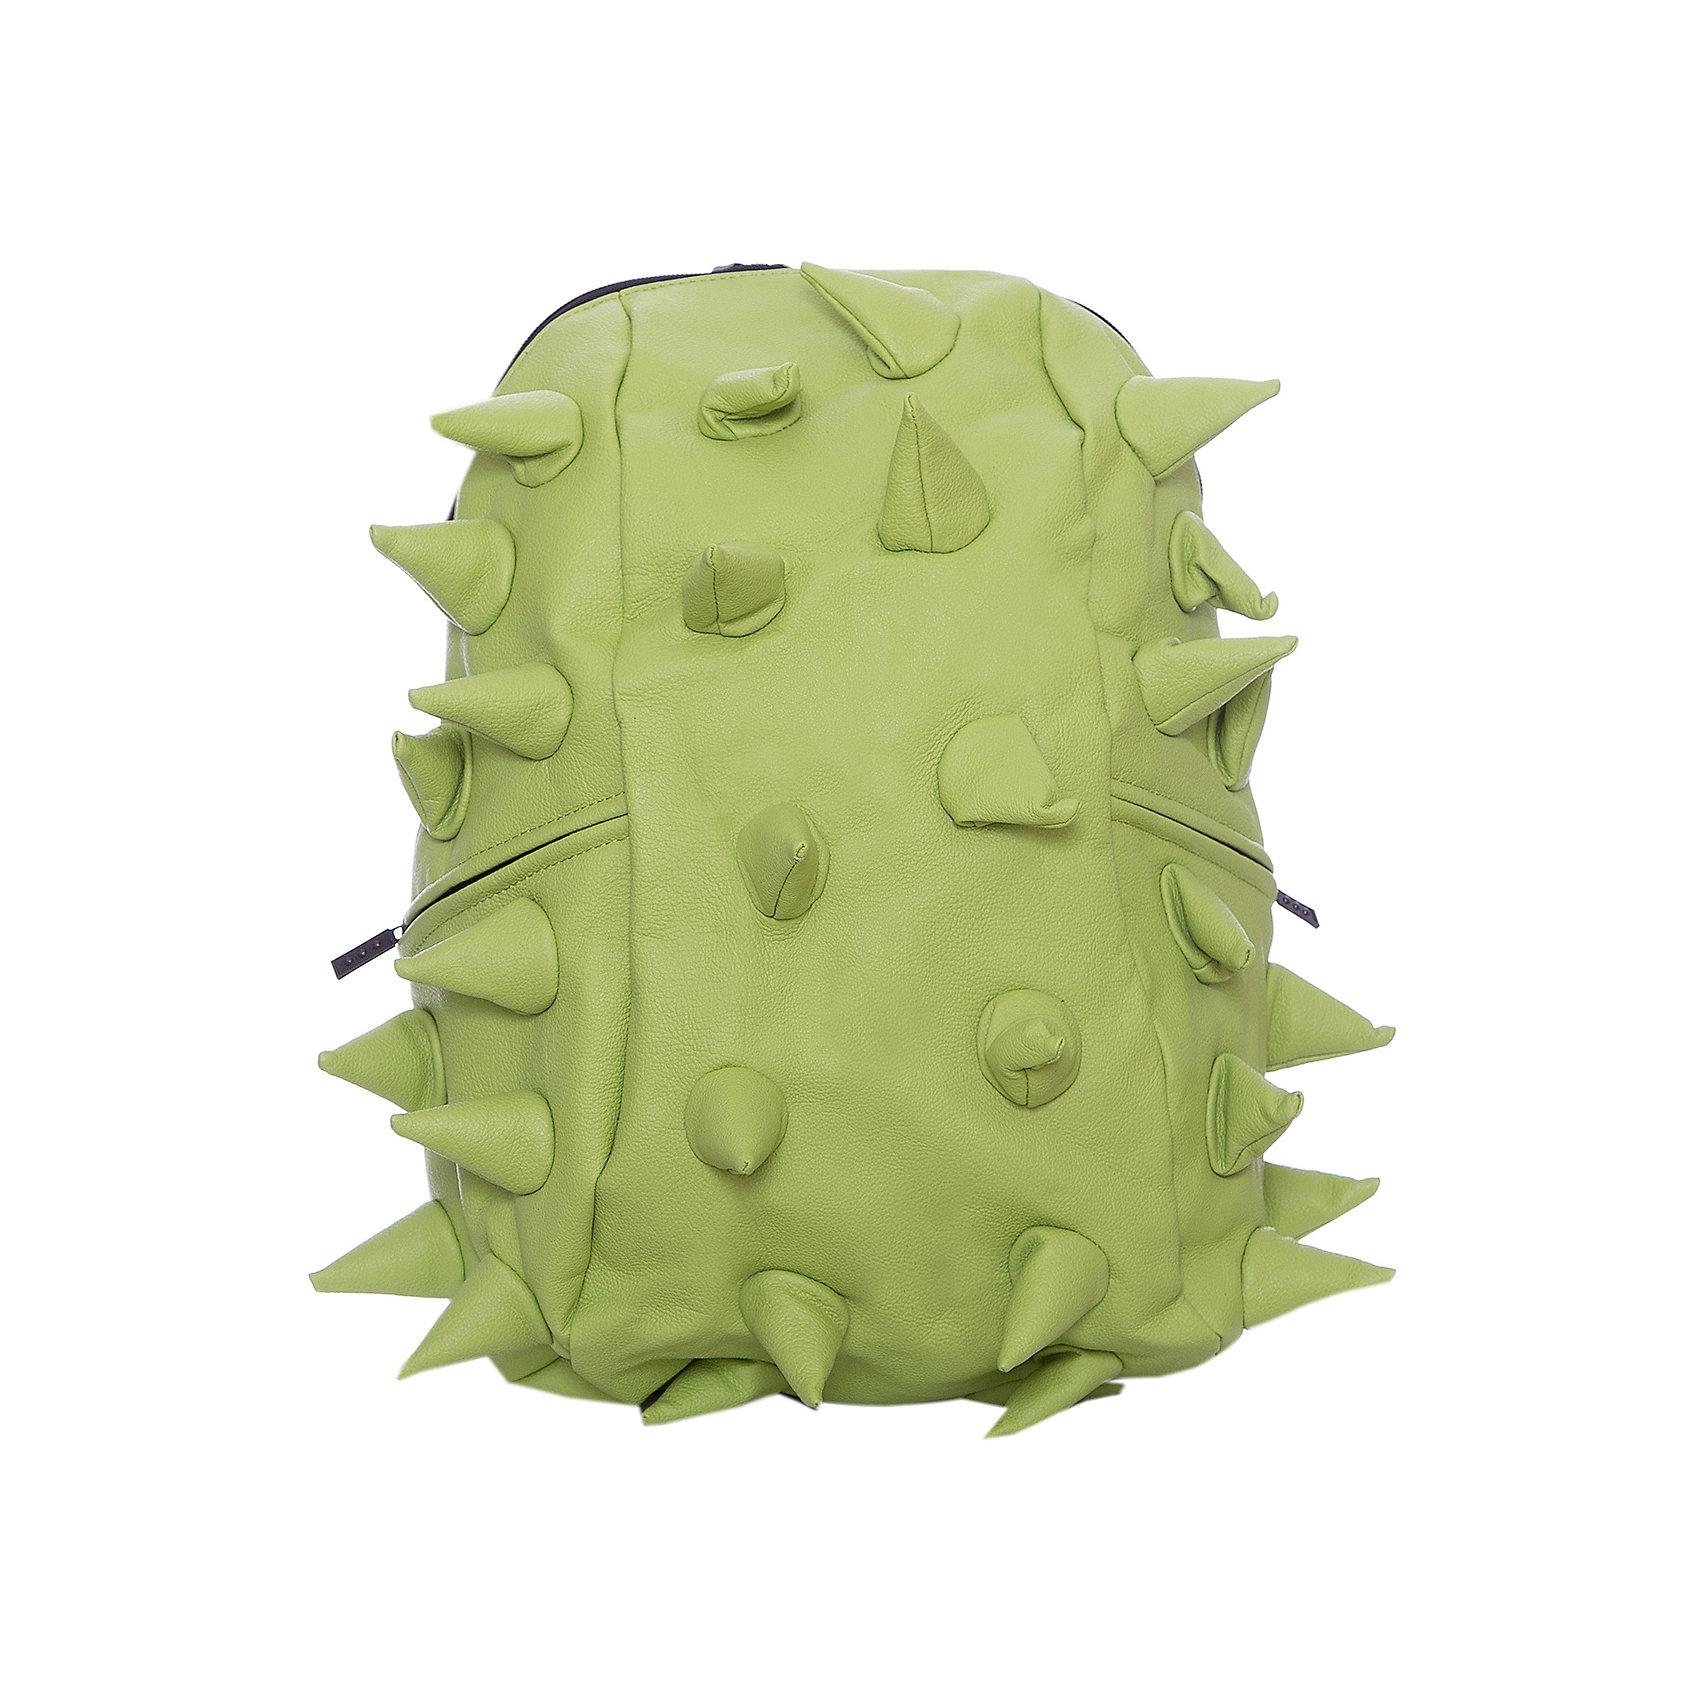 Рюкзак Rex Full, цвет Dinosour Lime (лайм)Рюкзаки<br>Вес: 0,8 кг<br>Размер: 46х35х20 см<br>Состав: рюкзак<br>Наличие светоотражающих элементов: нет<br>Материал: полиуретан<br><br>Ширина мм: 460<br>Глубина мм: 350<br>Высота мм: 200<br>Вес г: 800<br>Возраст от месяцев: 60<br>Возраст до месяцев: 720<br>Пол: Унисекс<br>Возраст: Детский<br>SKU: 7054089